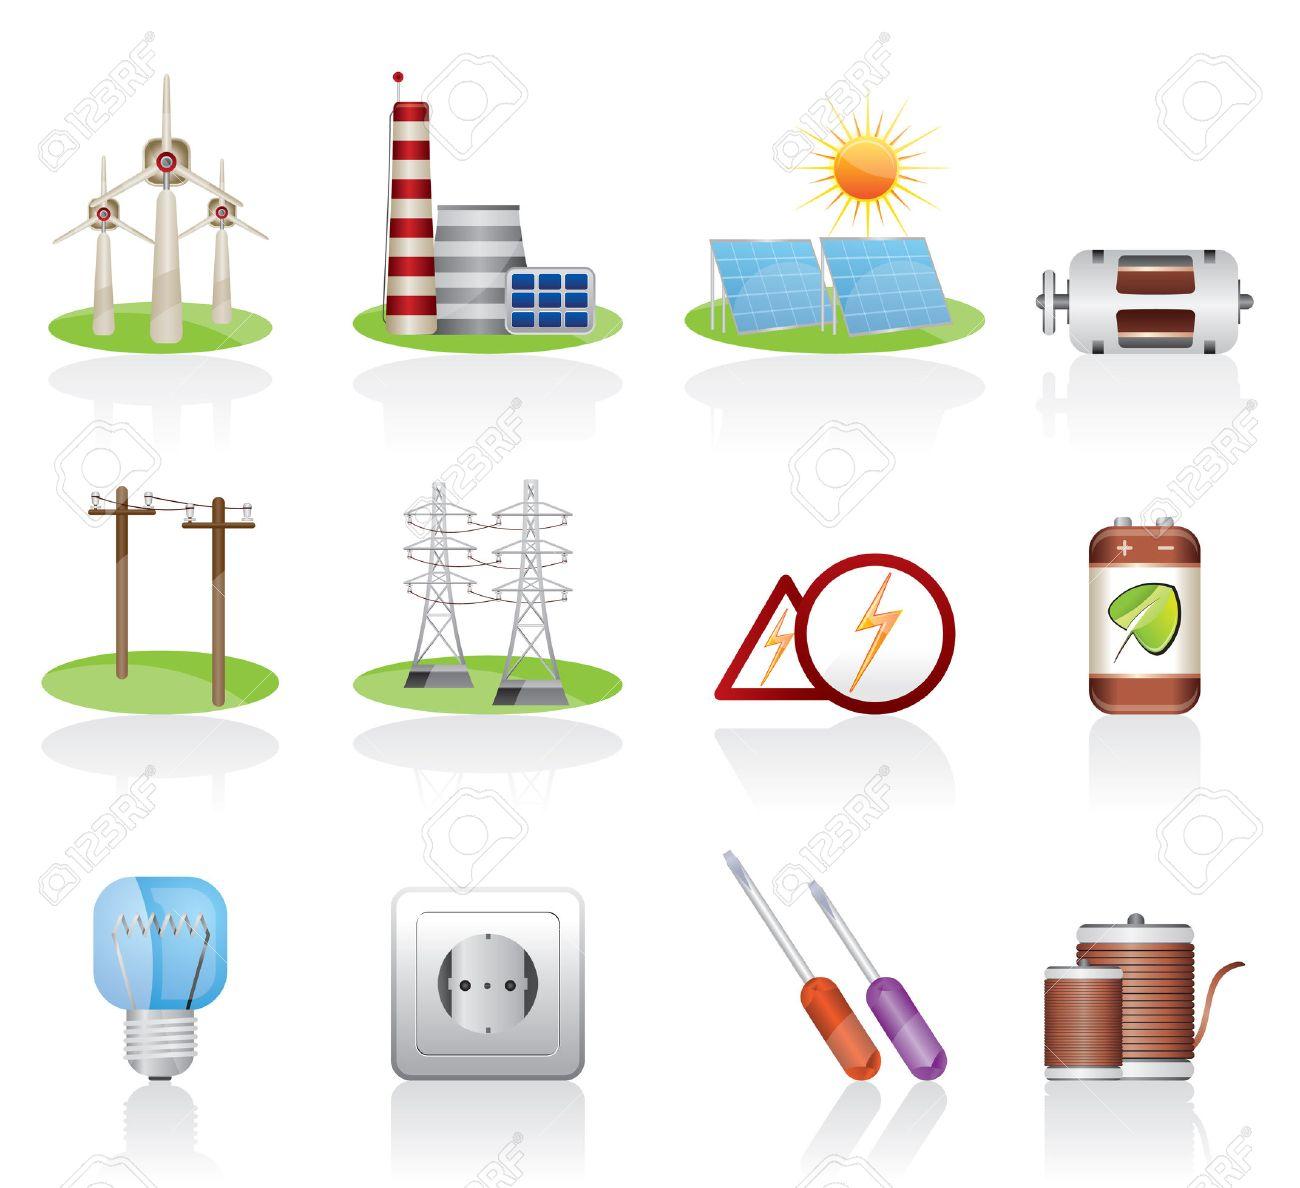 Electricity icon Stock Vector - 4397205